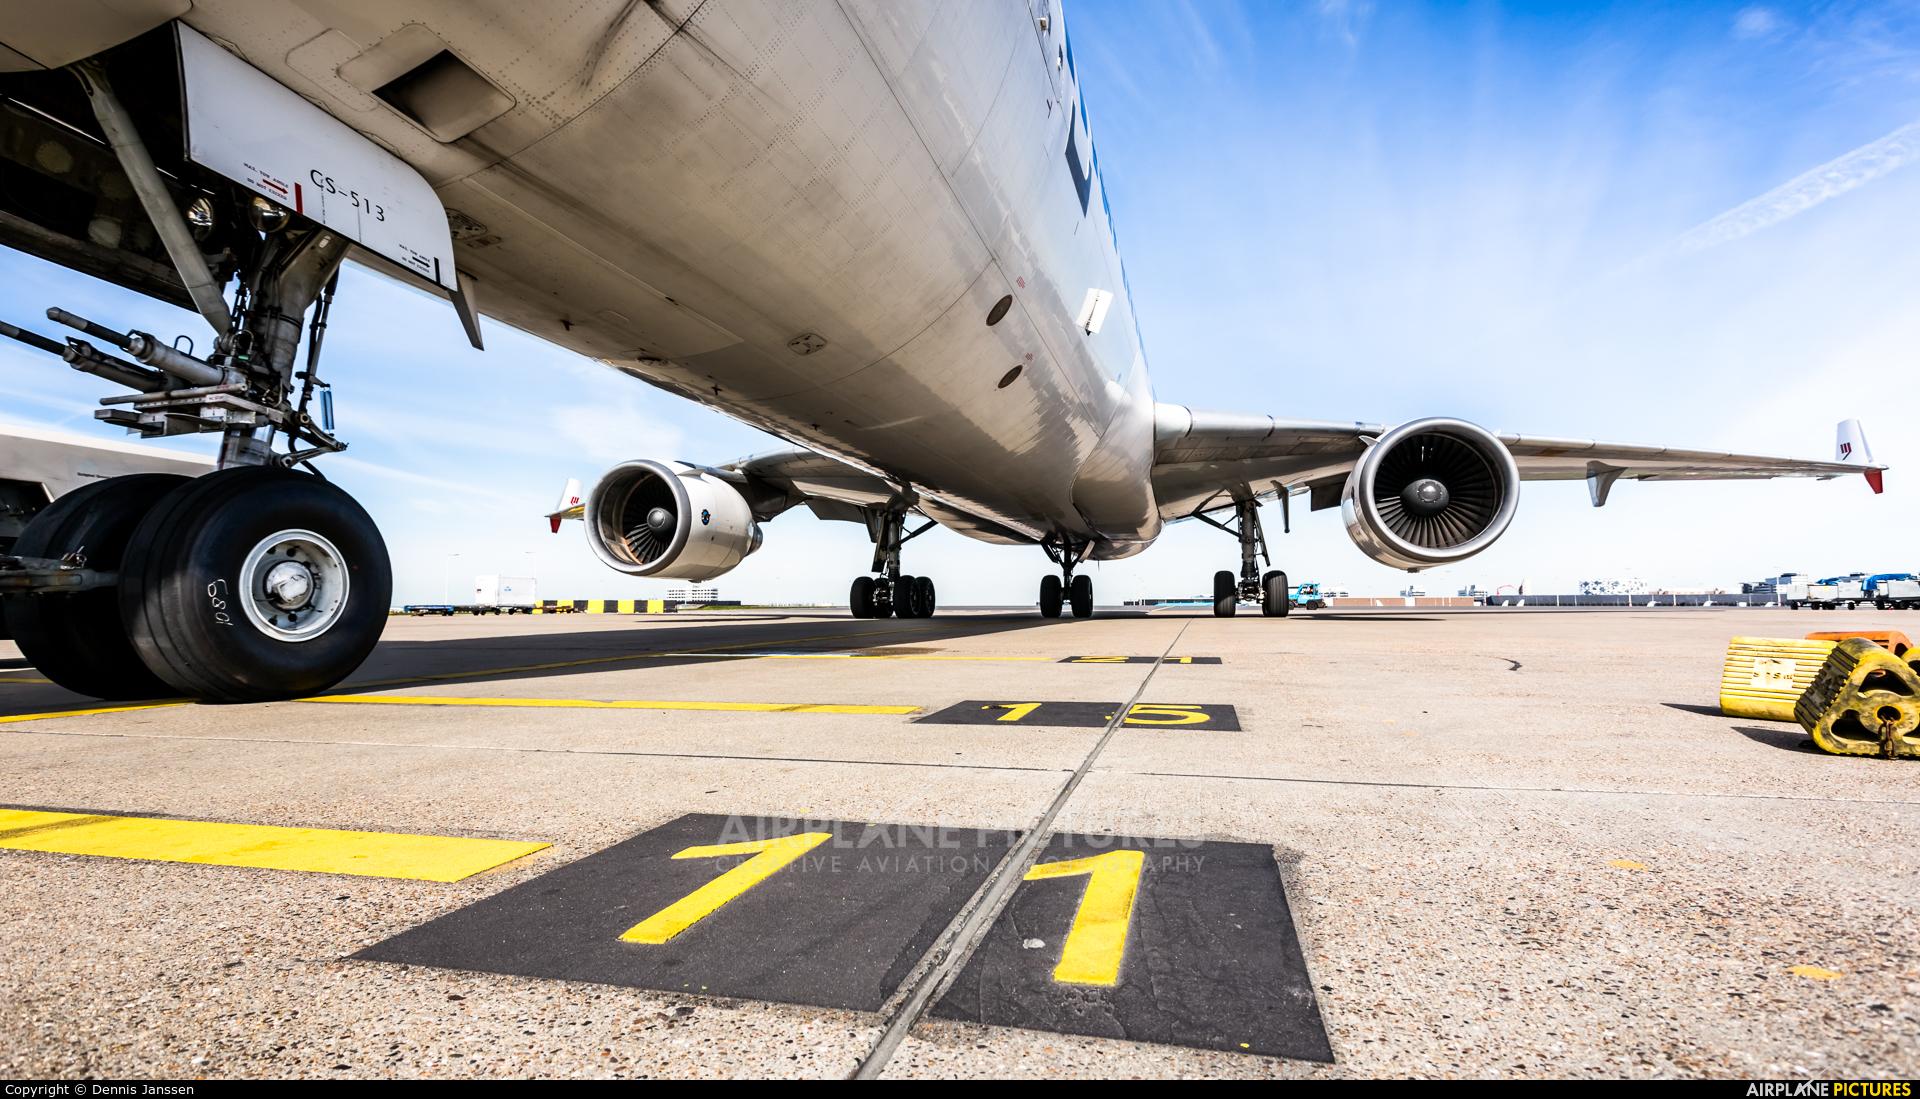 Martinair Cargo PH-MCS aircraft at Undisclosed location